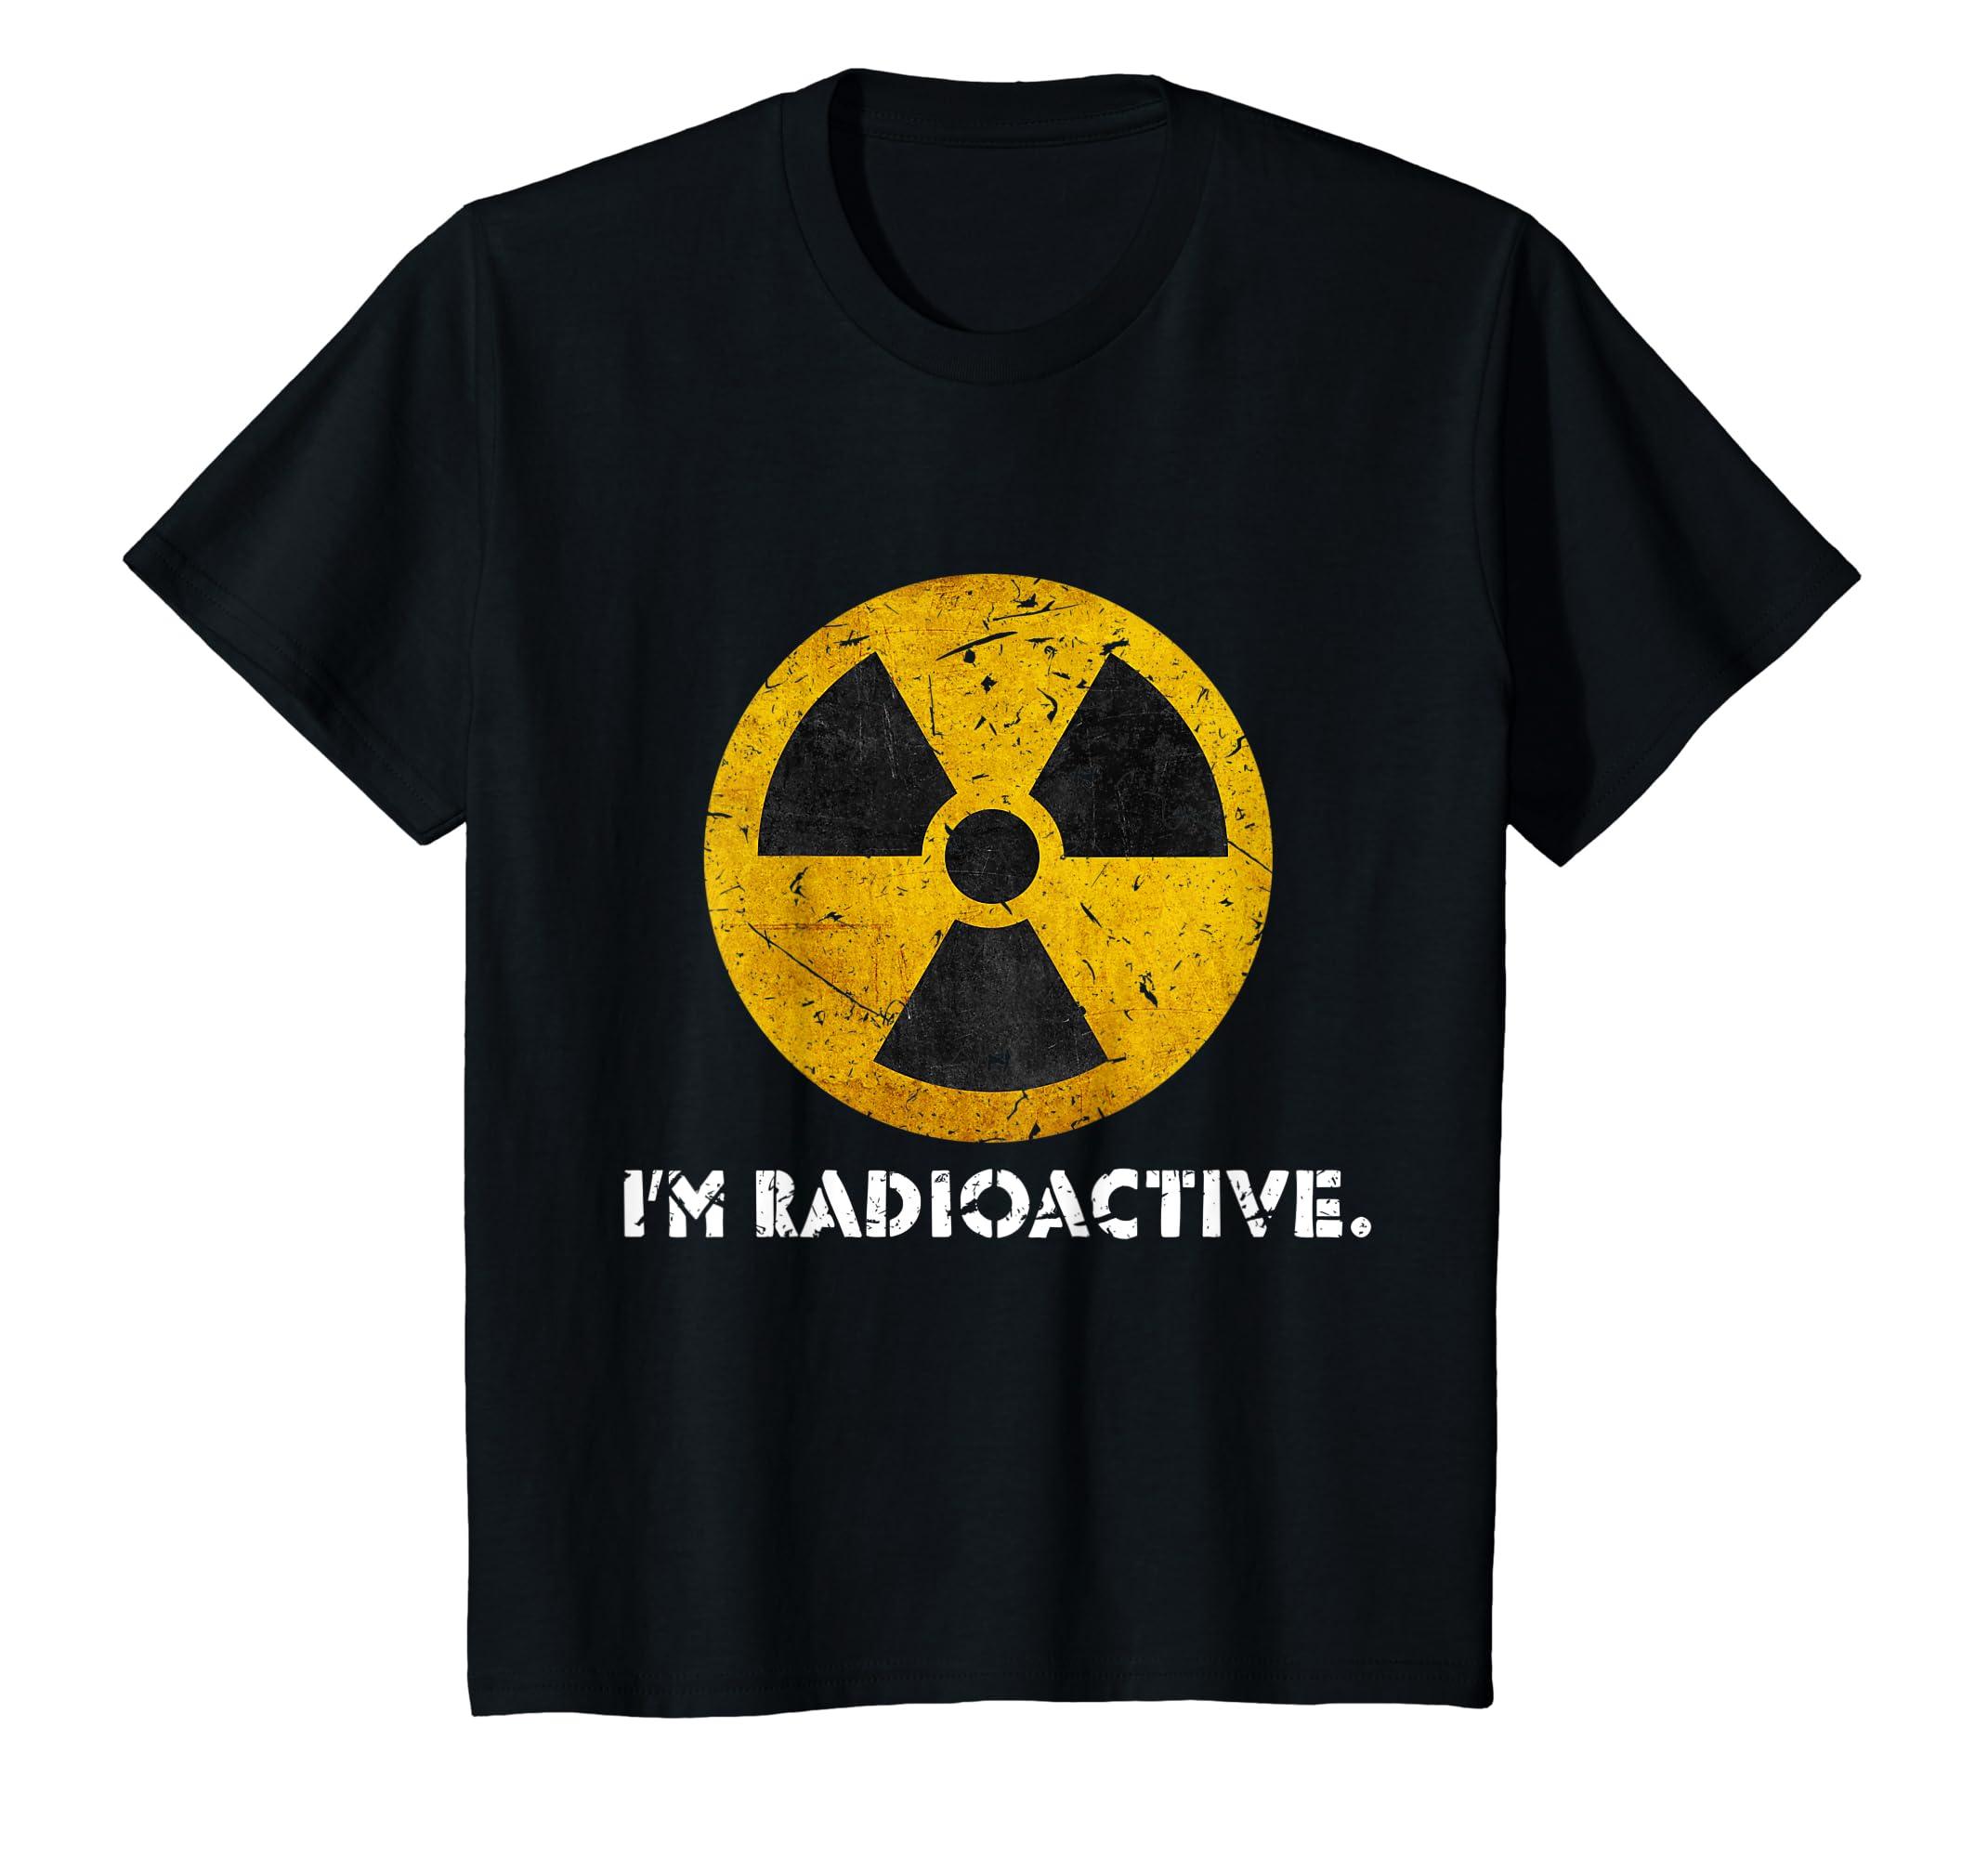 6ca4c731eebc5 Radioactive Shirt - Funny Tshirt for Men, Boys and Kids